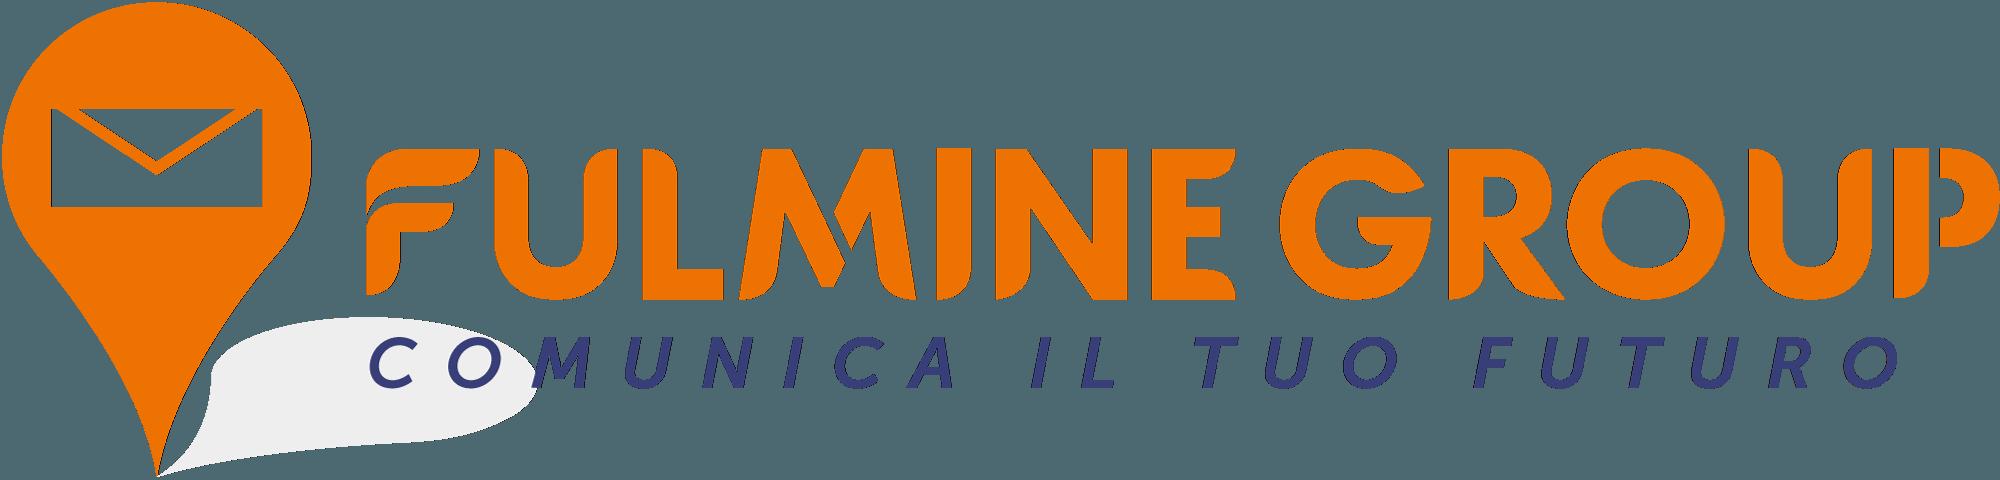 Fulmine Group